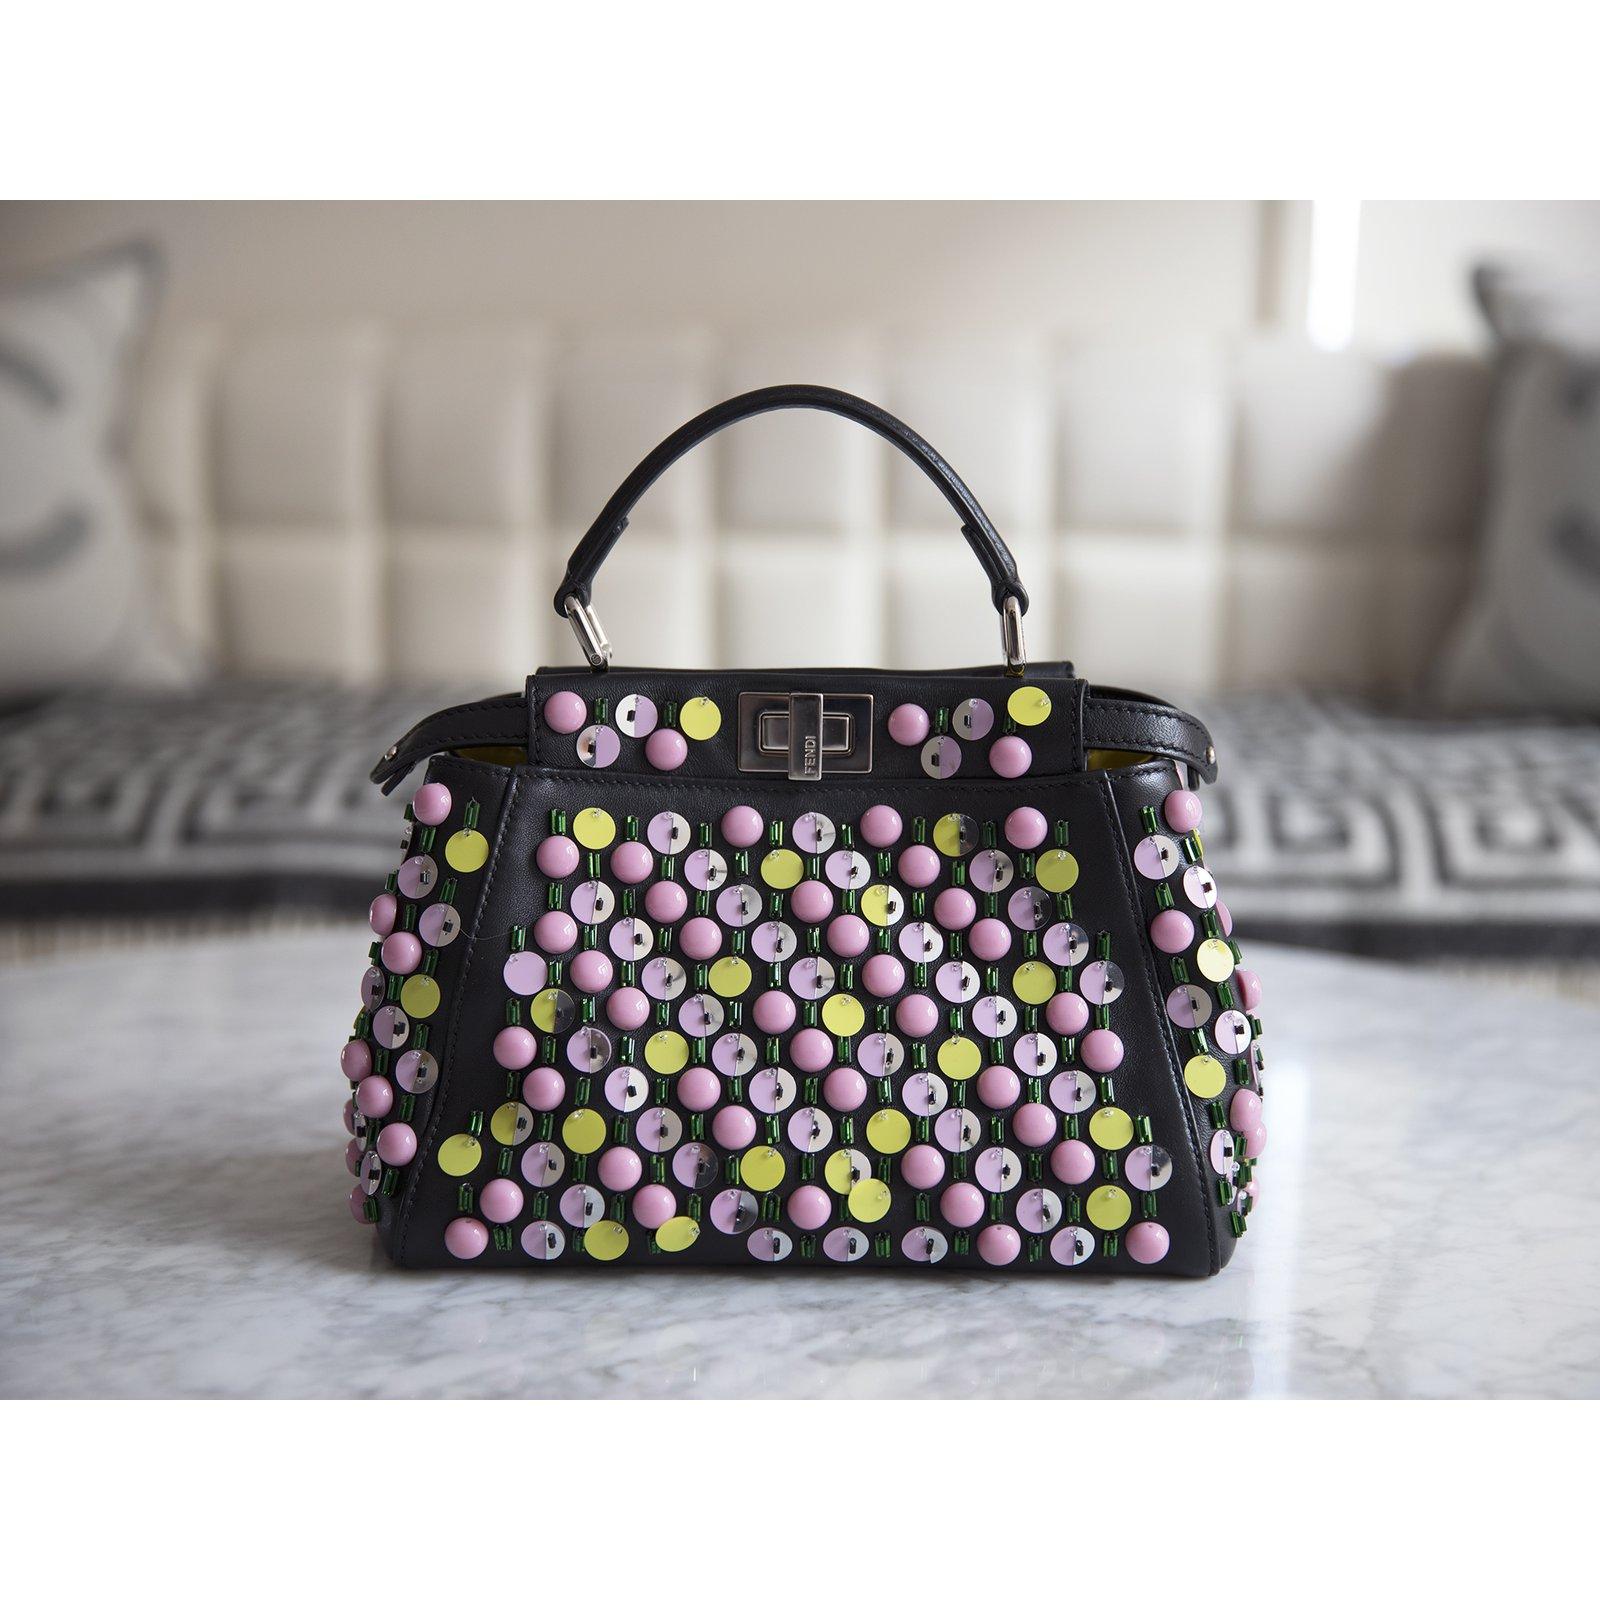 Fendi Mini Peekaboo Bag Embellished Embroidered Apple Satchel Handbags  Leather Black 5b799797aba1e